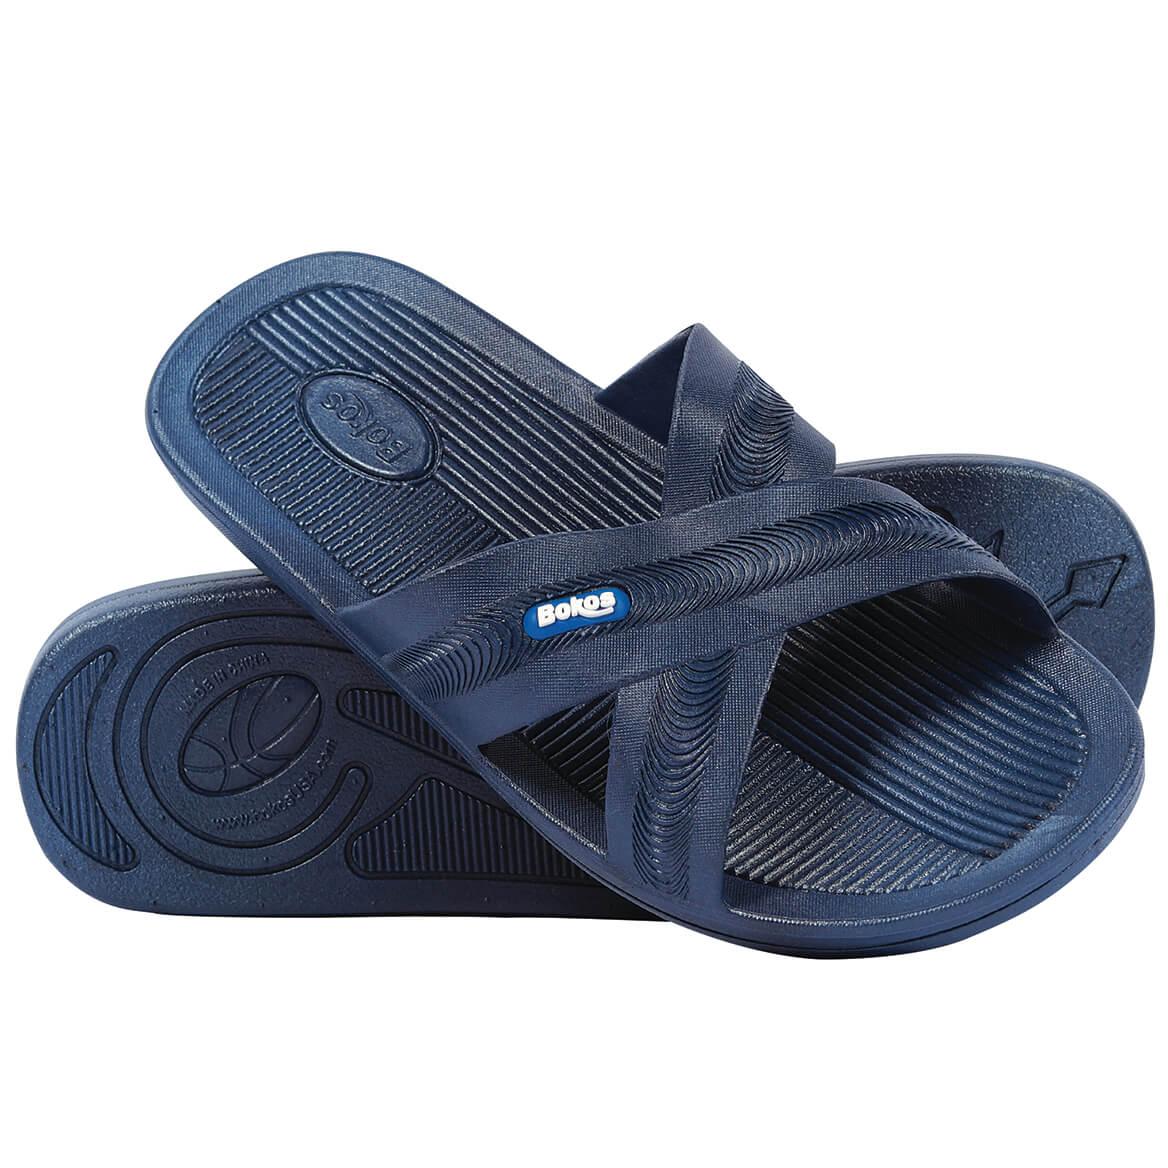 96f39b6e7 Bokos Men s Rubber Sandals - Mens Sandals - Miles Kimball